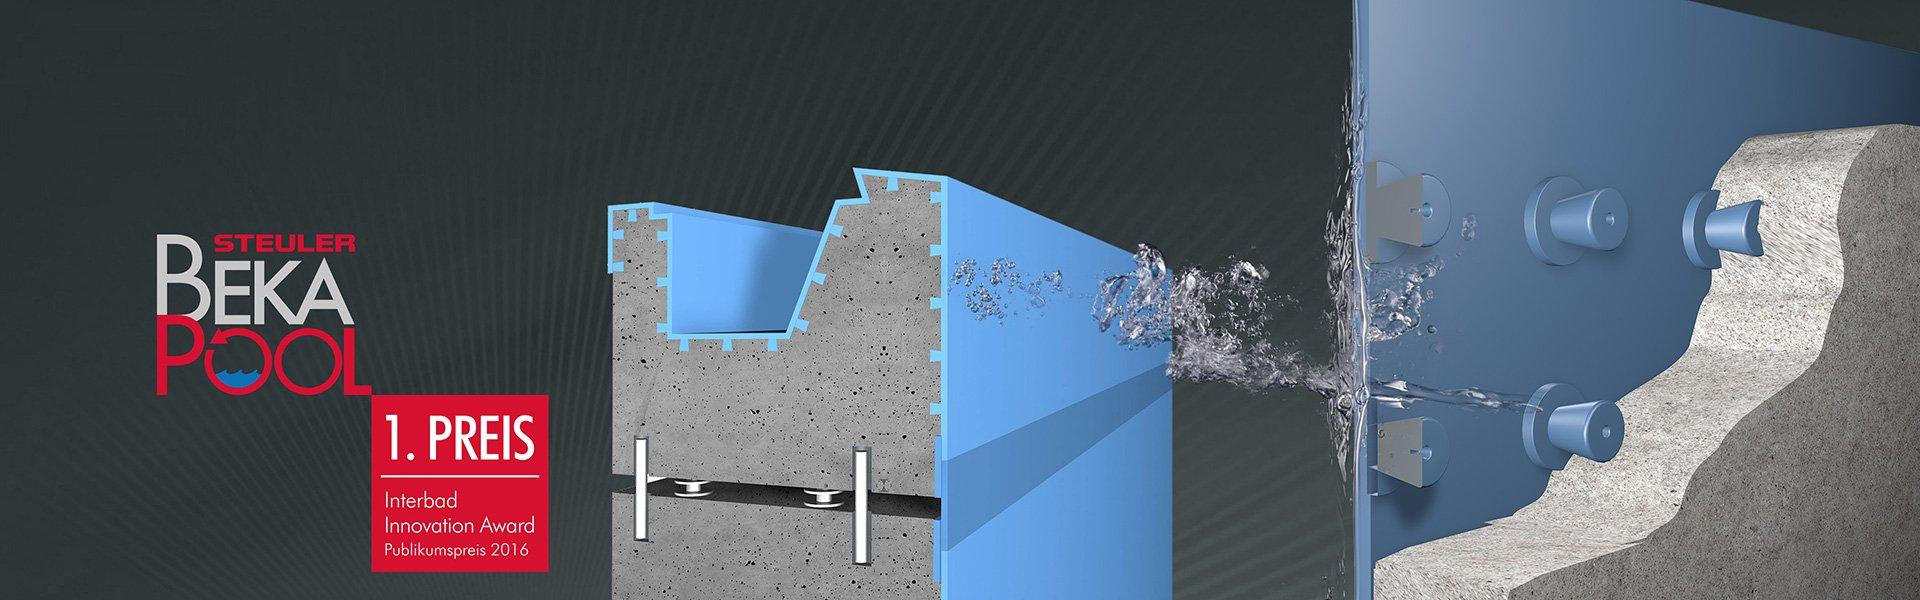 Bekapool Steuler Pool Linings Querschnitt